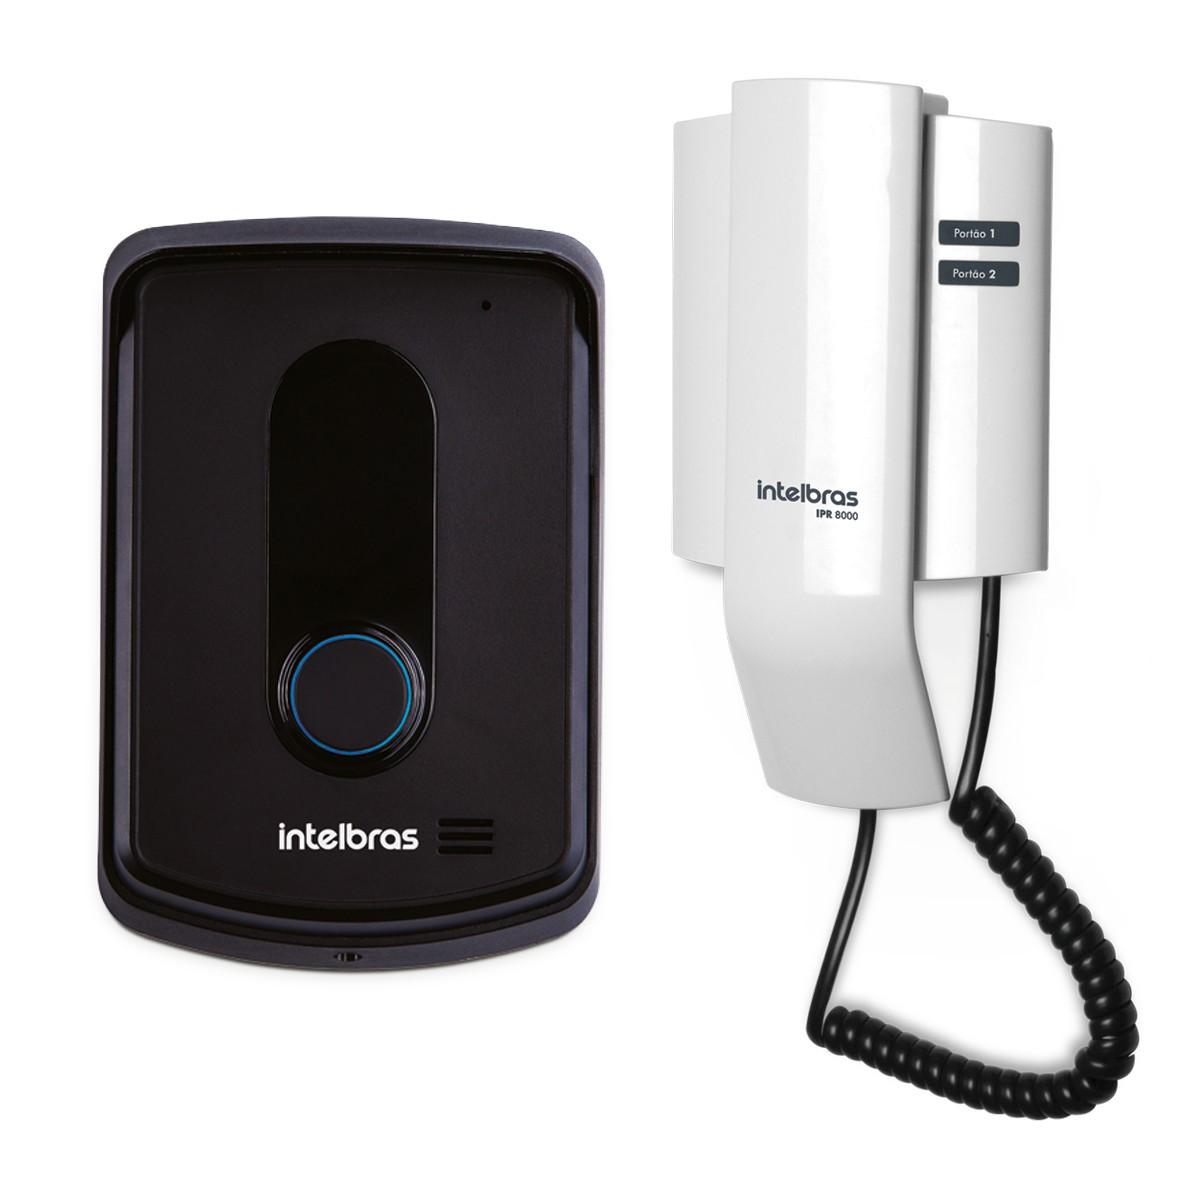 kit-porteiro-eletronico-ipr8010-intelbras-02-cameras-bullet-tudo-forte-tela-monitor-7-polegadas-lcd-colorido-acessorios-01